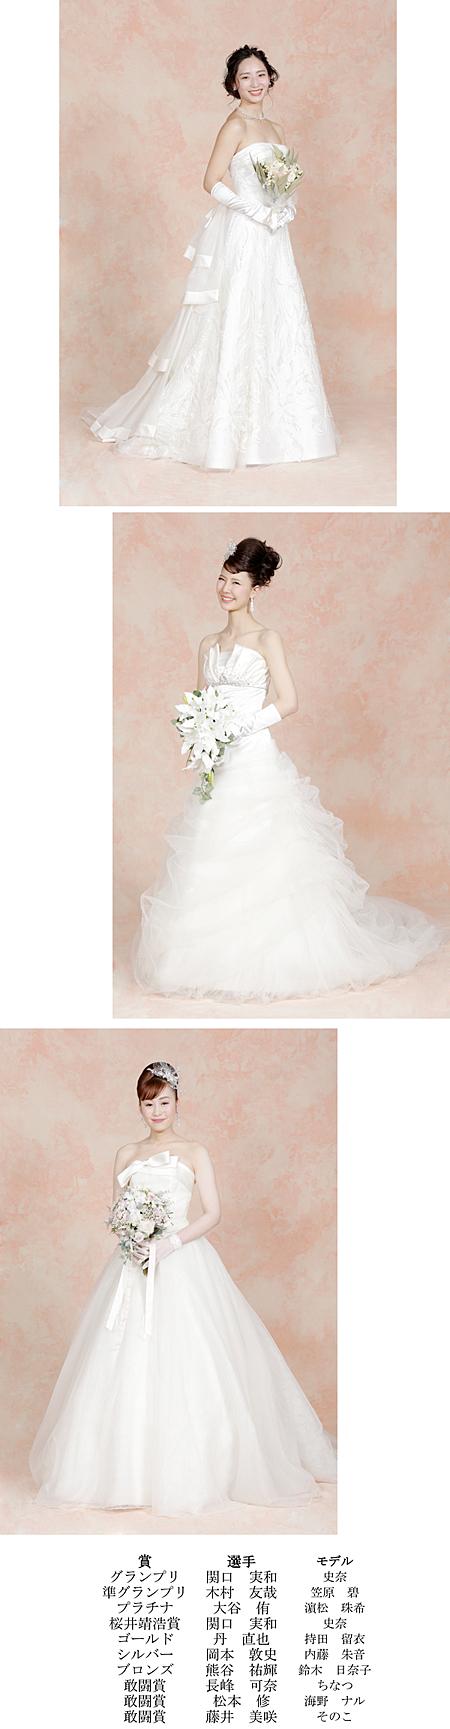 yokota_bridal_con2019